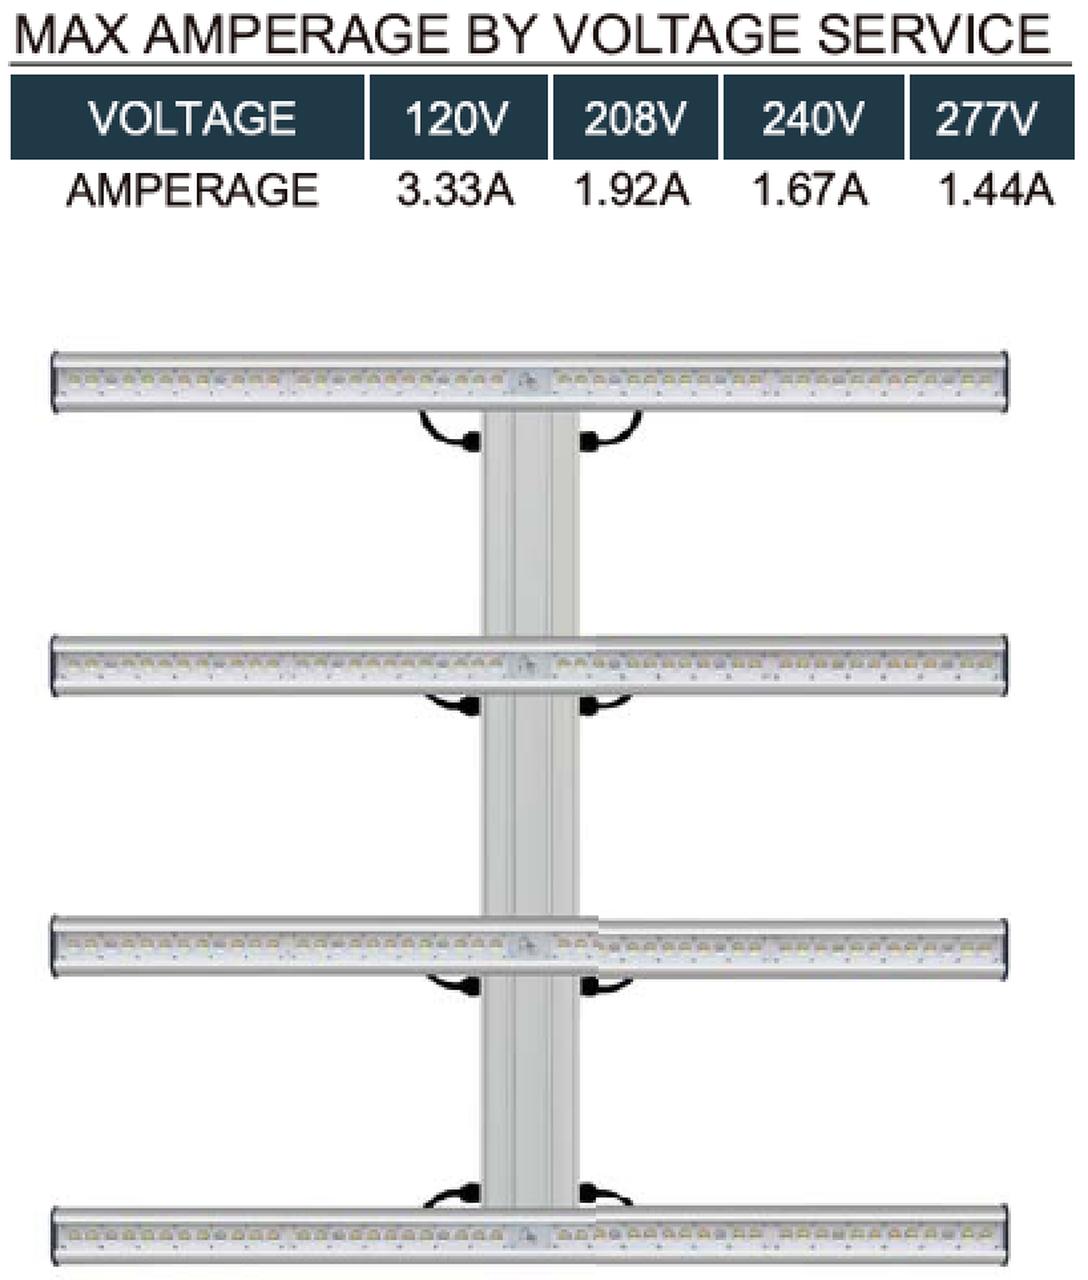 Flora X4s Full-Spectrum LED Grow Light with built-in dimmer nehydro.com